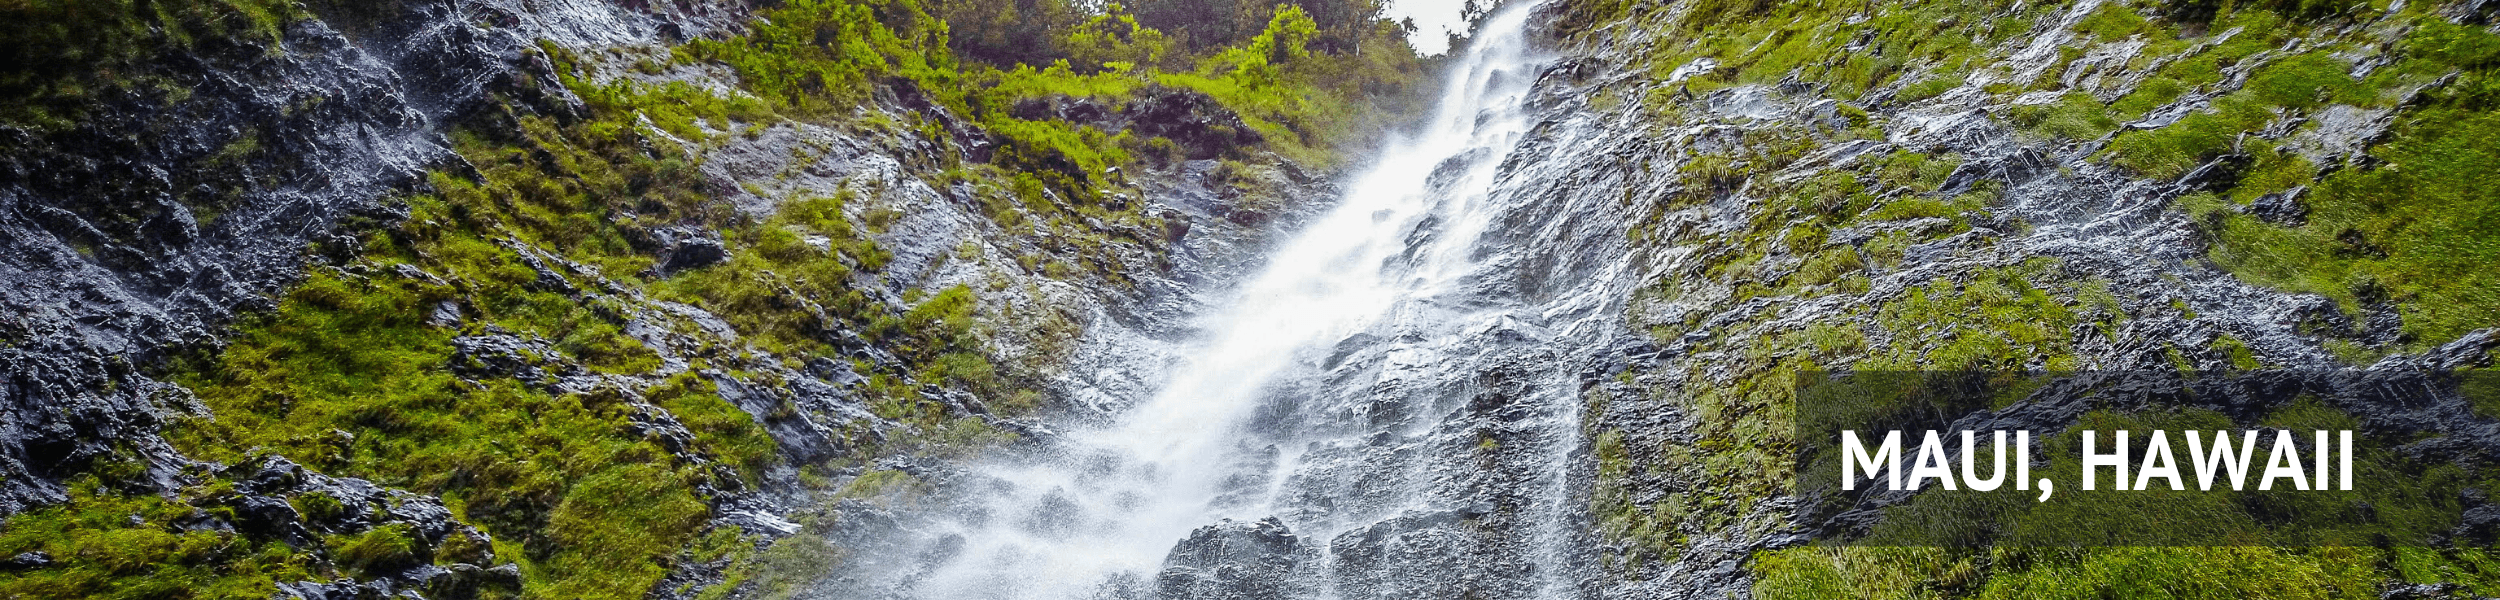 Maui Hiking Header